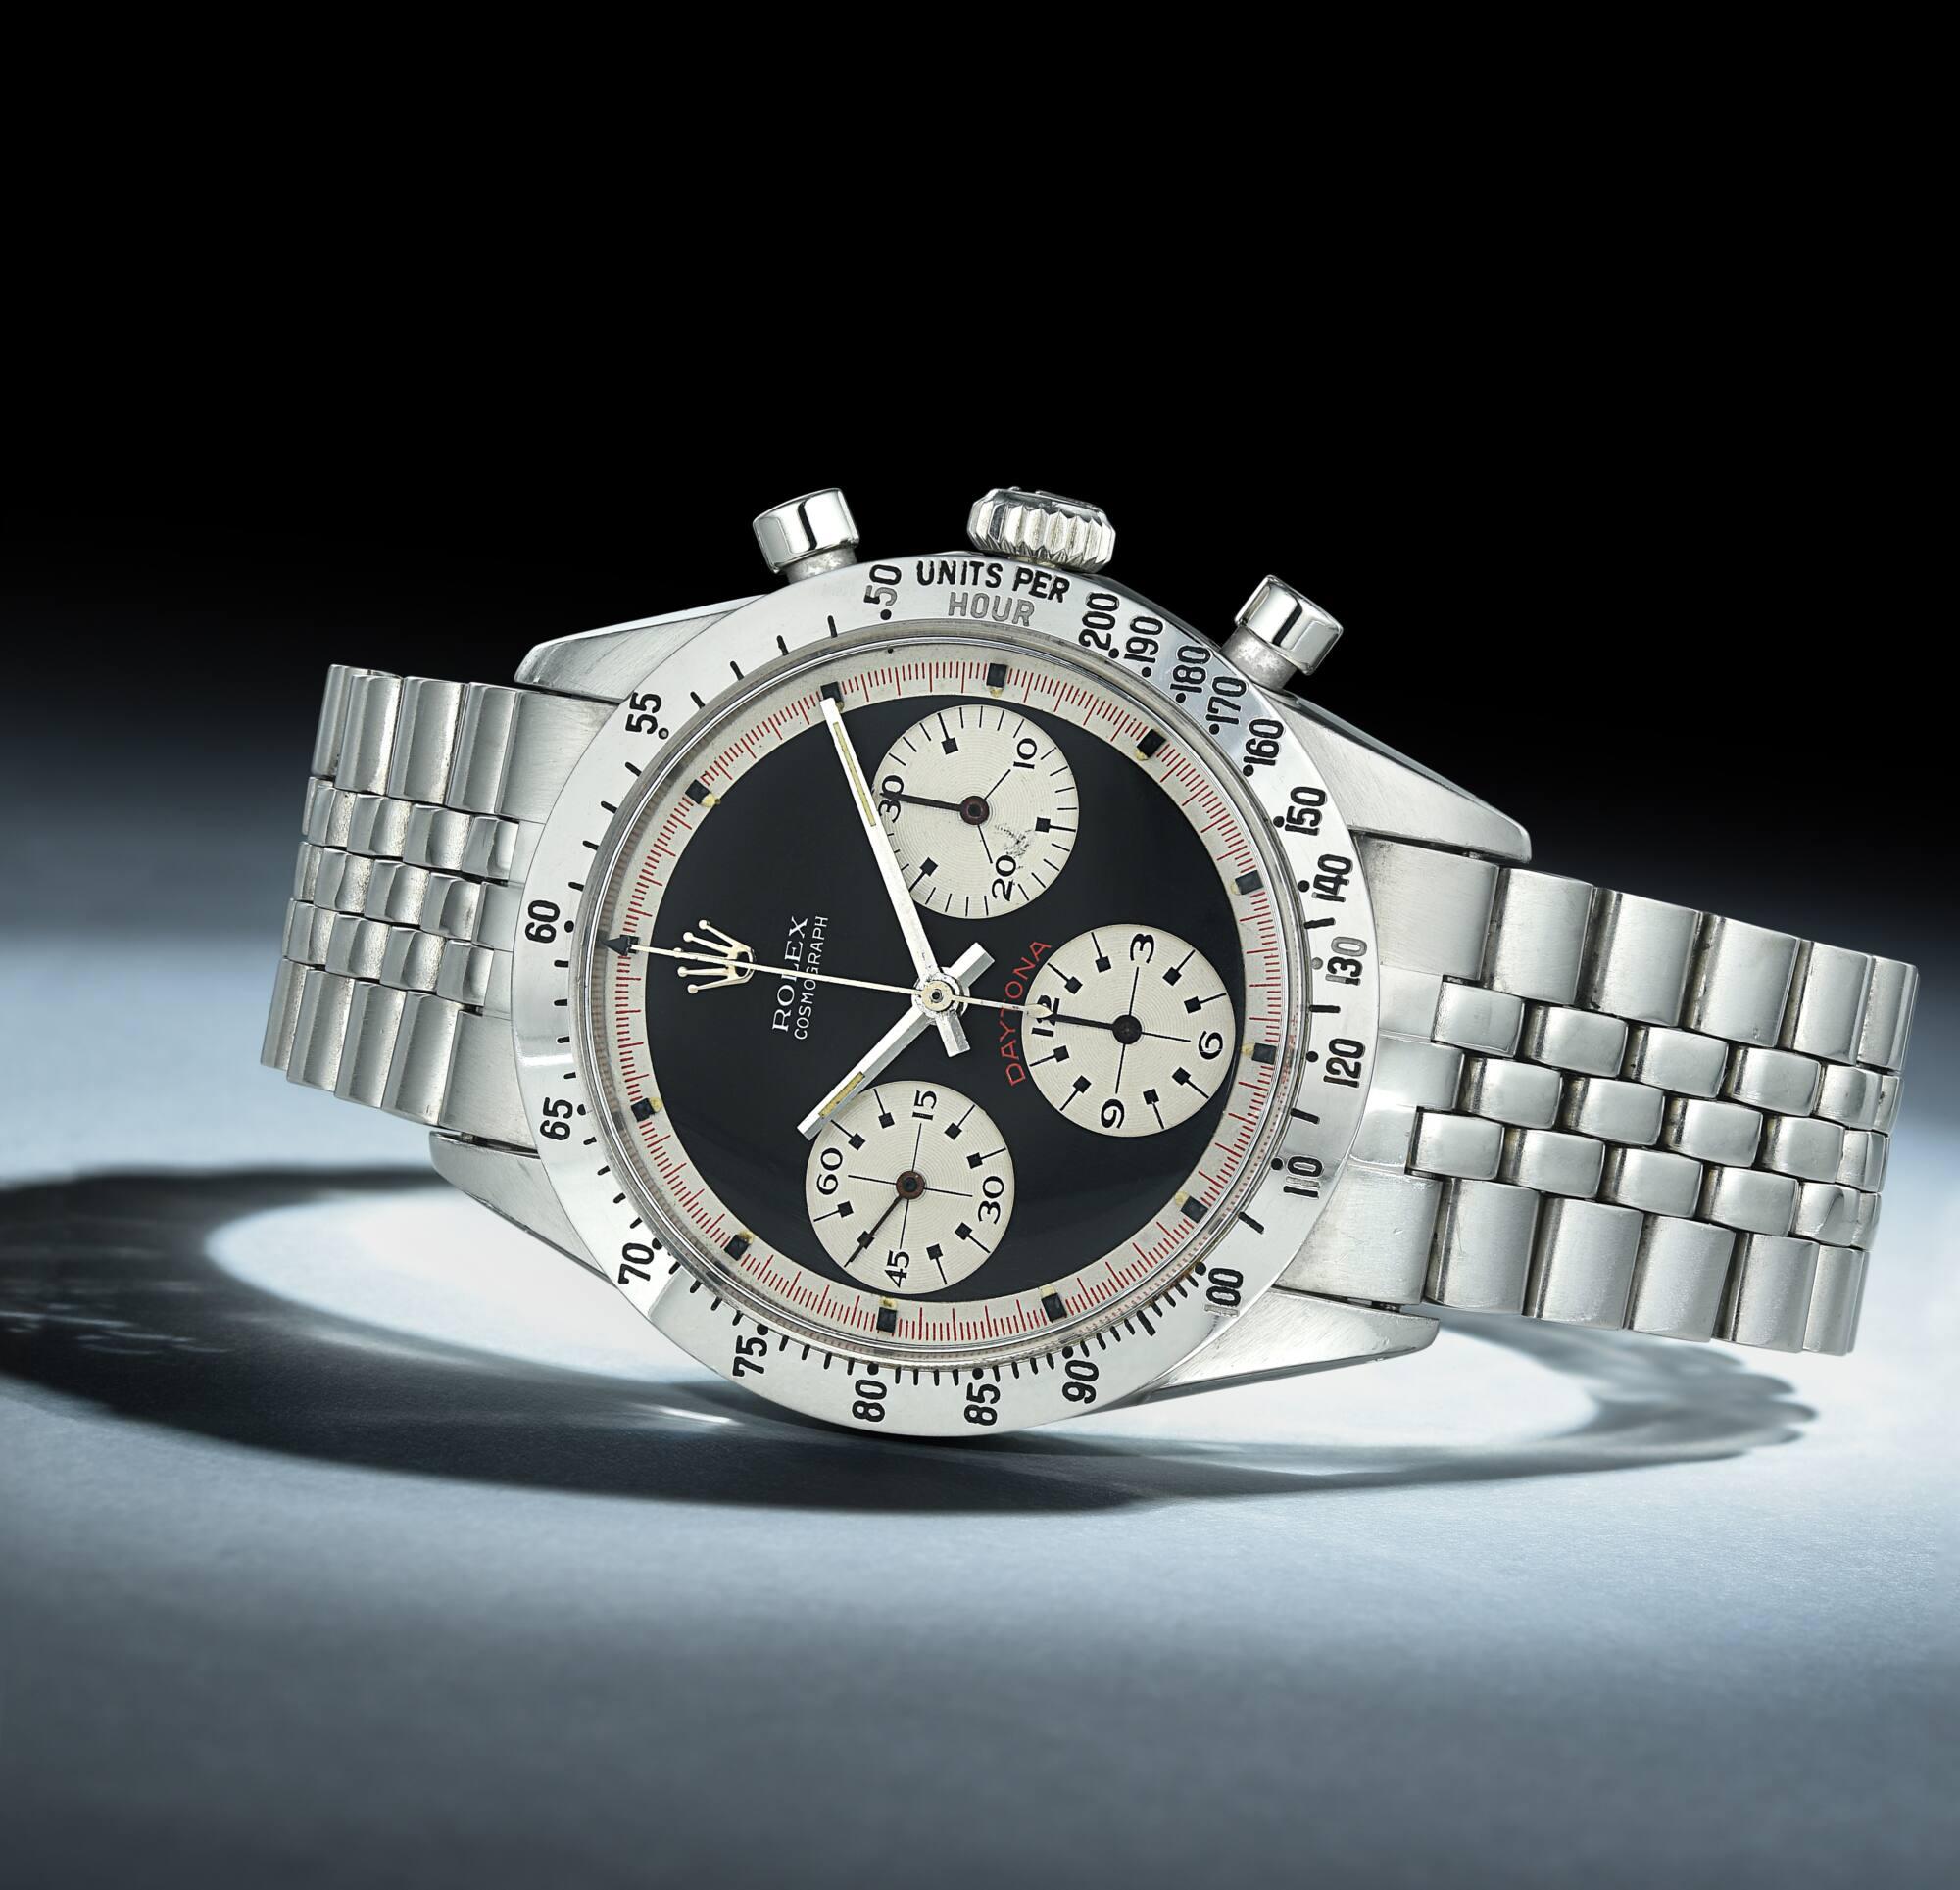 Important Watches by Fortuna - MondaniWeb